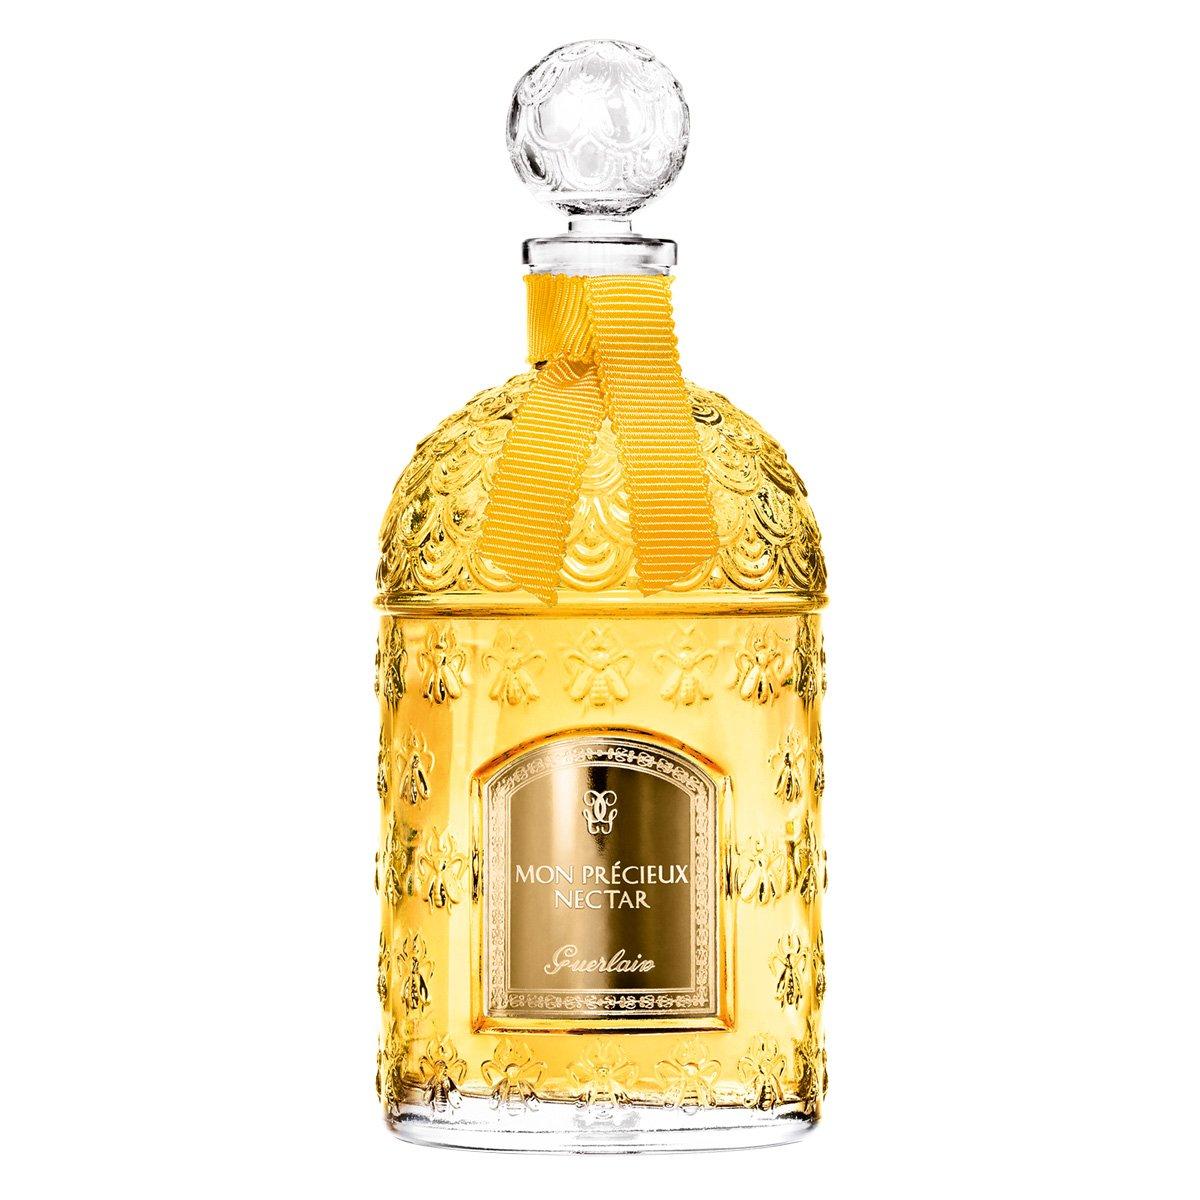 Guerlain Mon Precieux Nectar